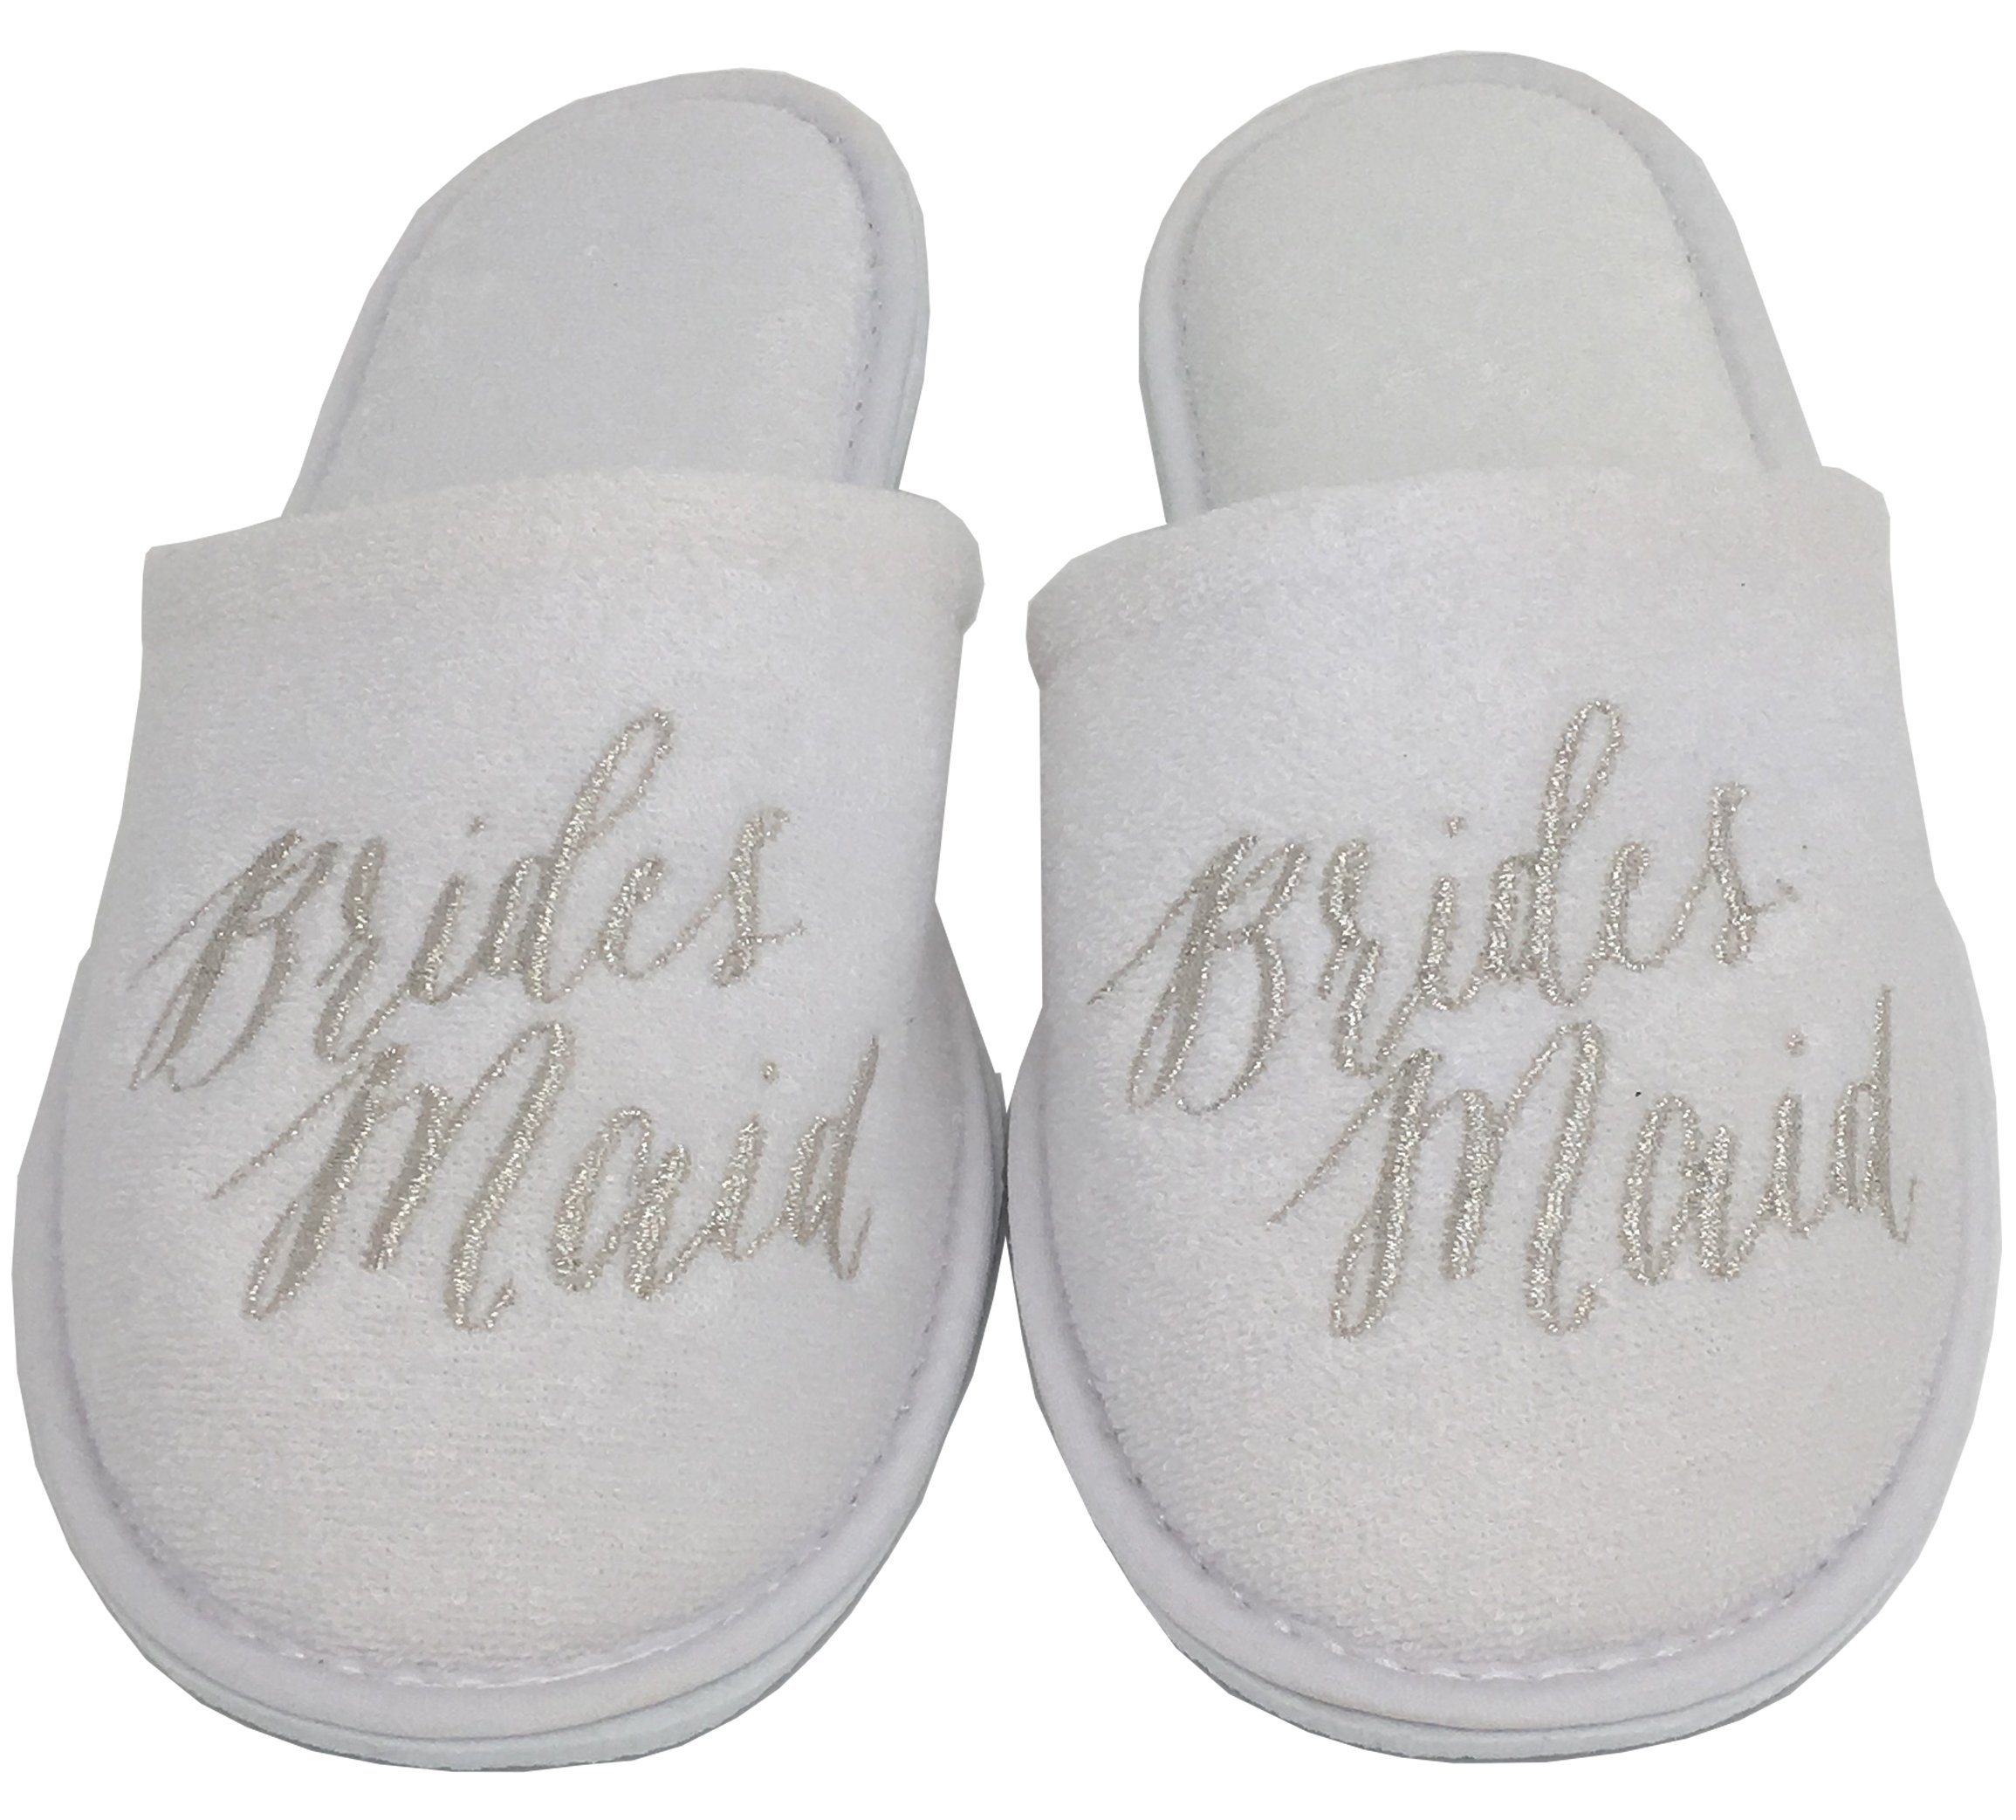 Personalized Slippers Wedding Slippers - (Medium (W6-8), Bridesmaid)